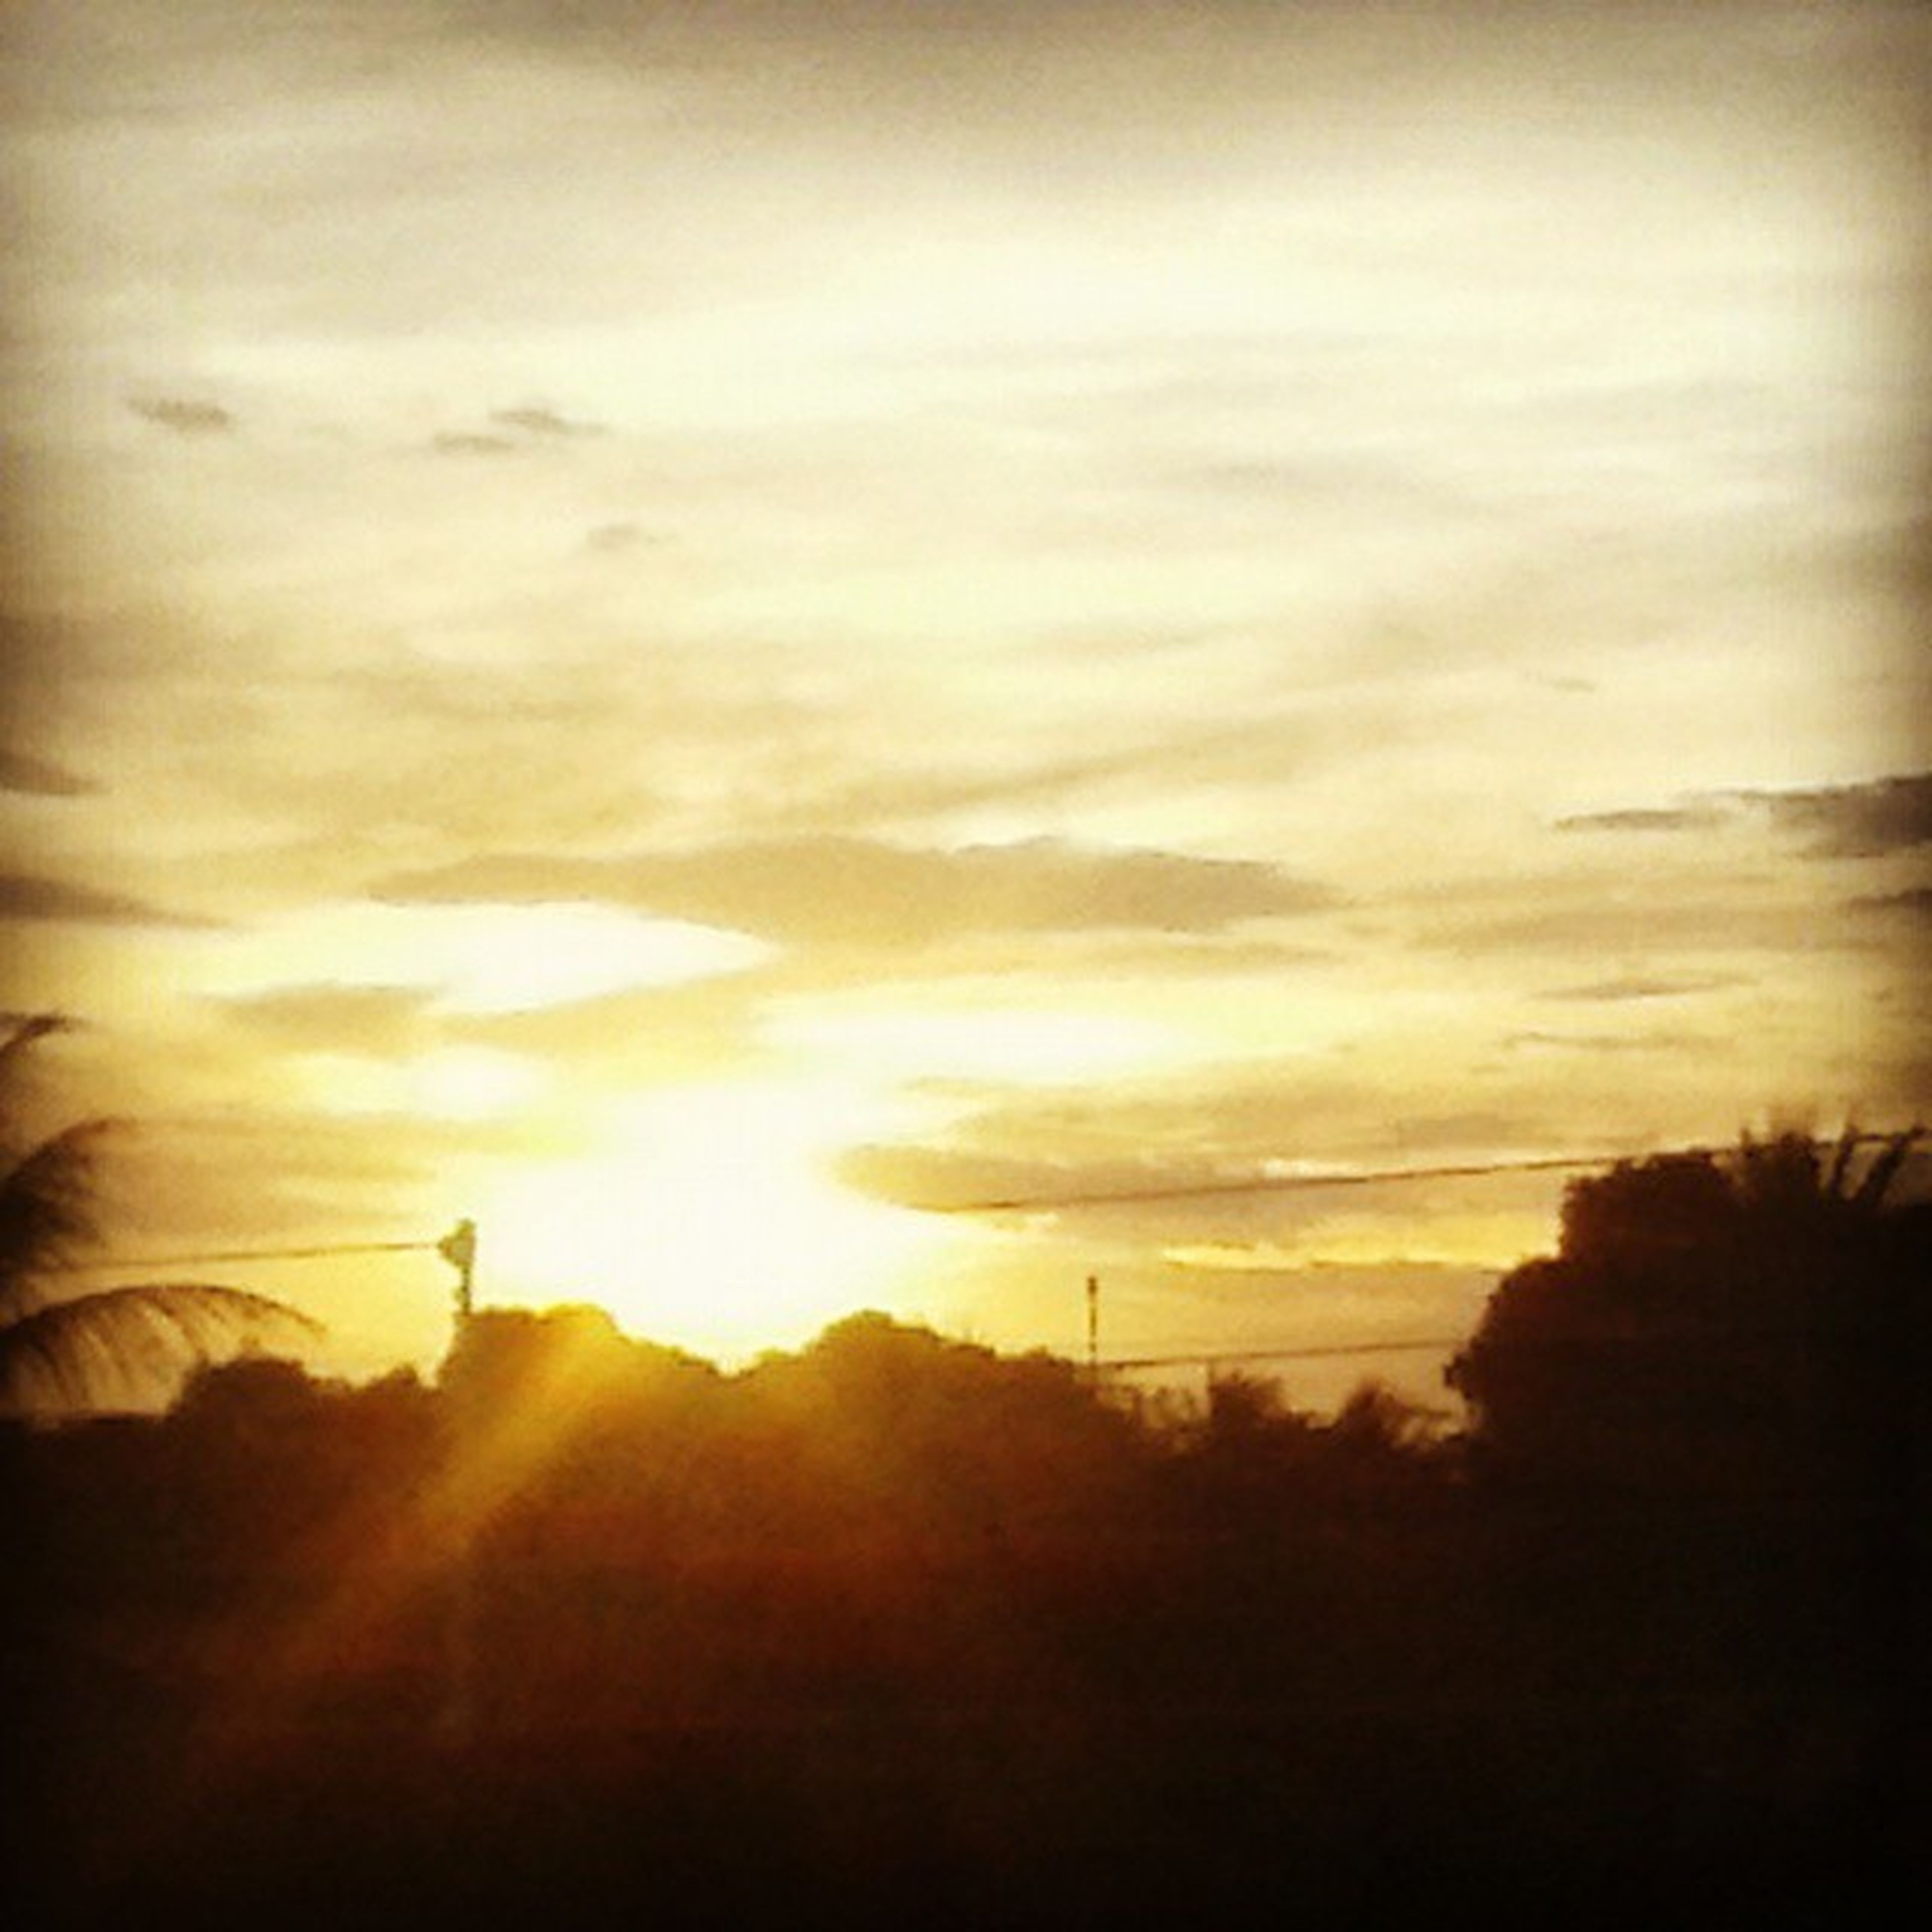 sunset, silhouette, sky, sun, tranquility, tranquil scene, scenics, beauty in nature, landscape, orange color, nature, cloud - sky, idyllic, sunlight, tree, field, cloud, sunbeam, outdoors, no people